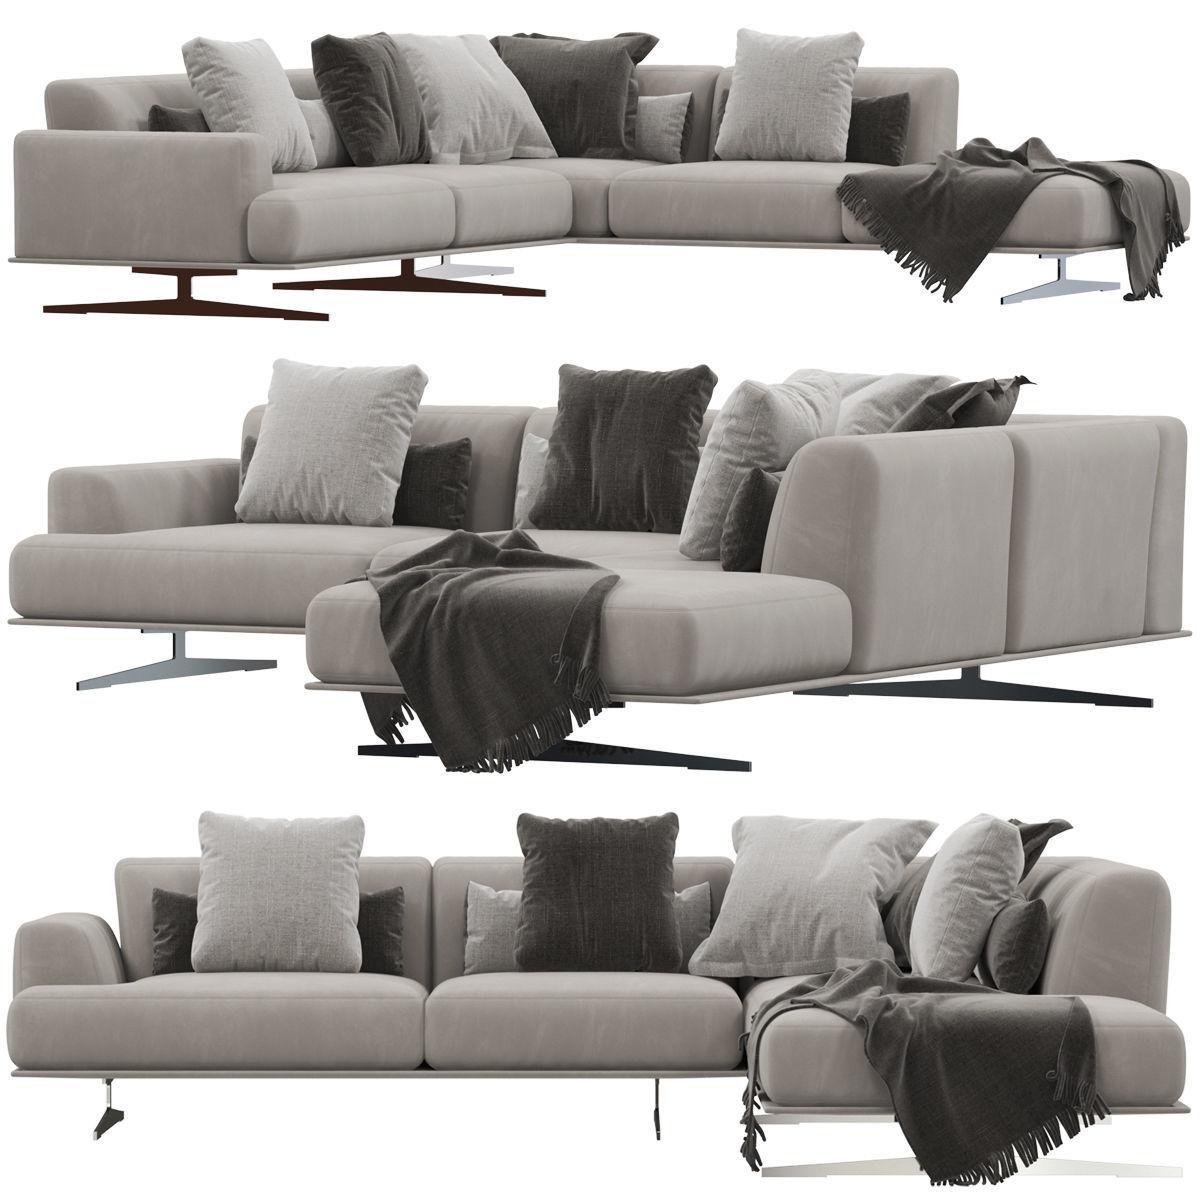 Max Divani ALBACHIARA sofa